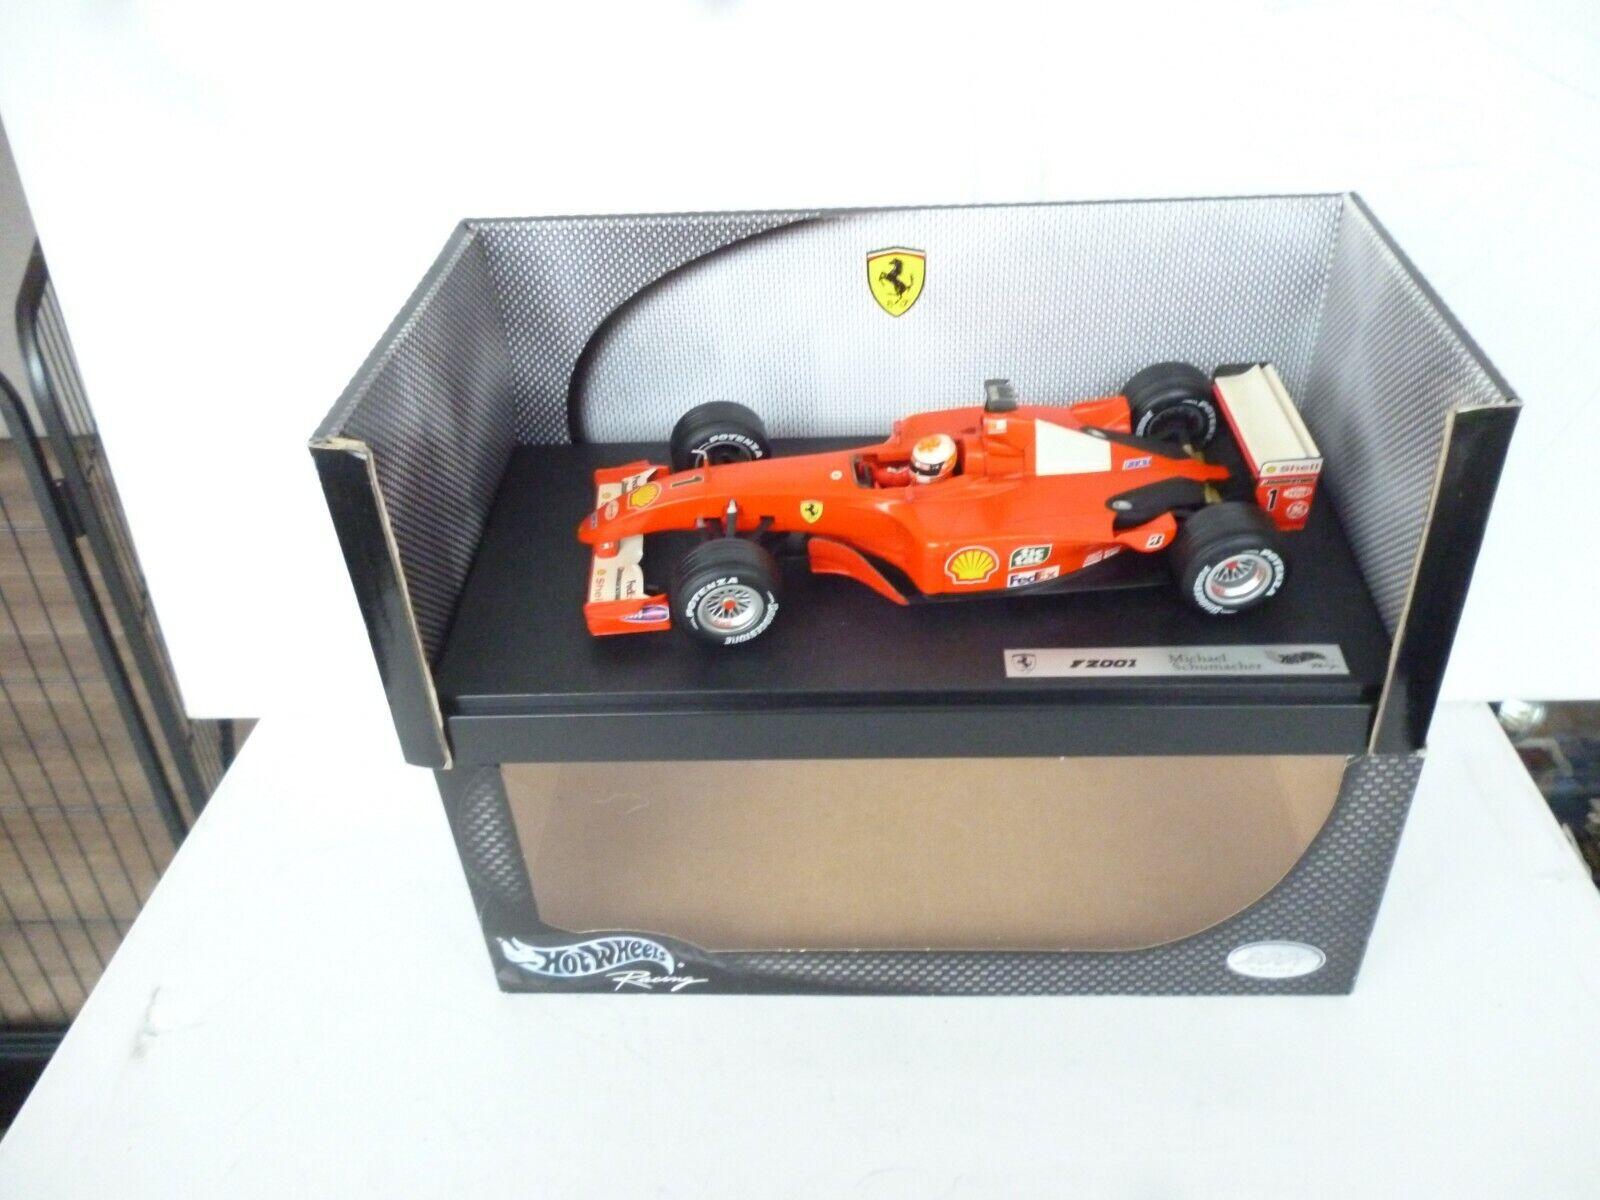 1 18 Hot Wheels Ferrari F1  NO 1  2001  M.Schumacher  NM BOX 1 18